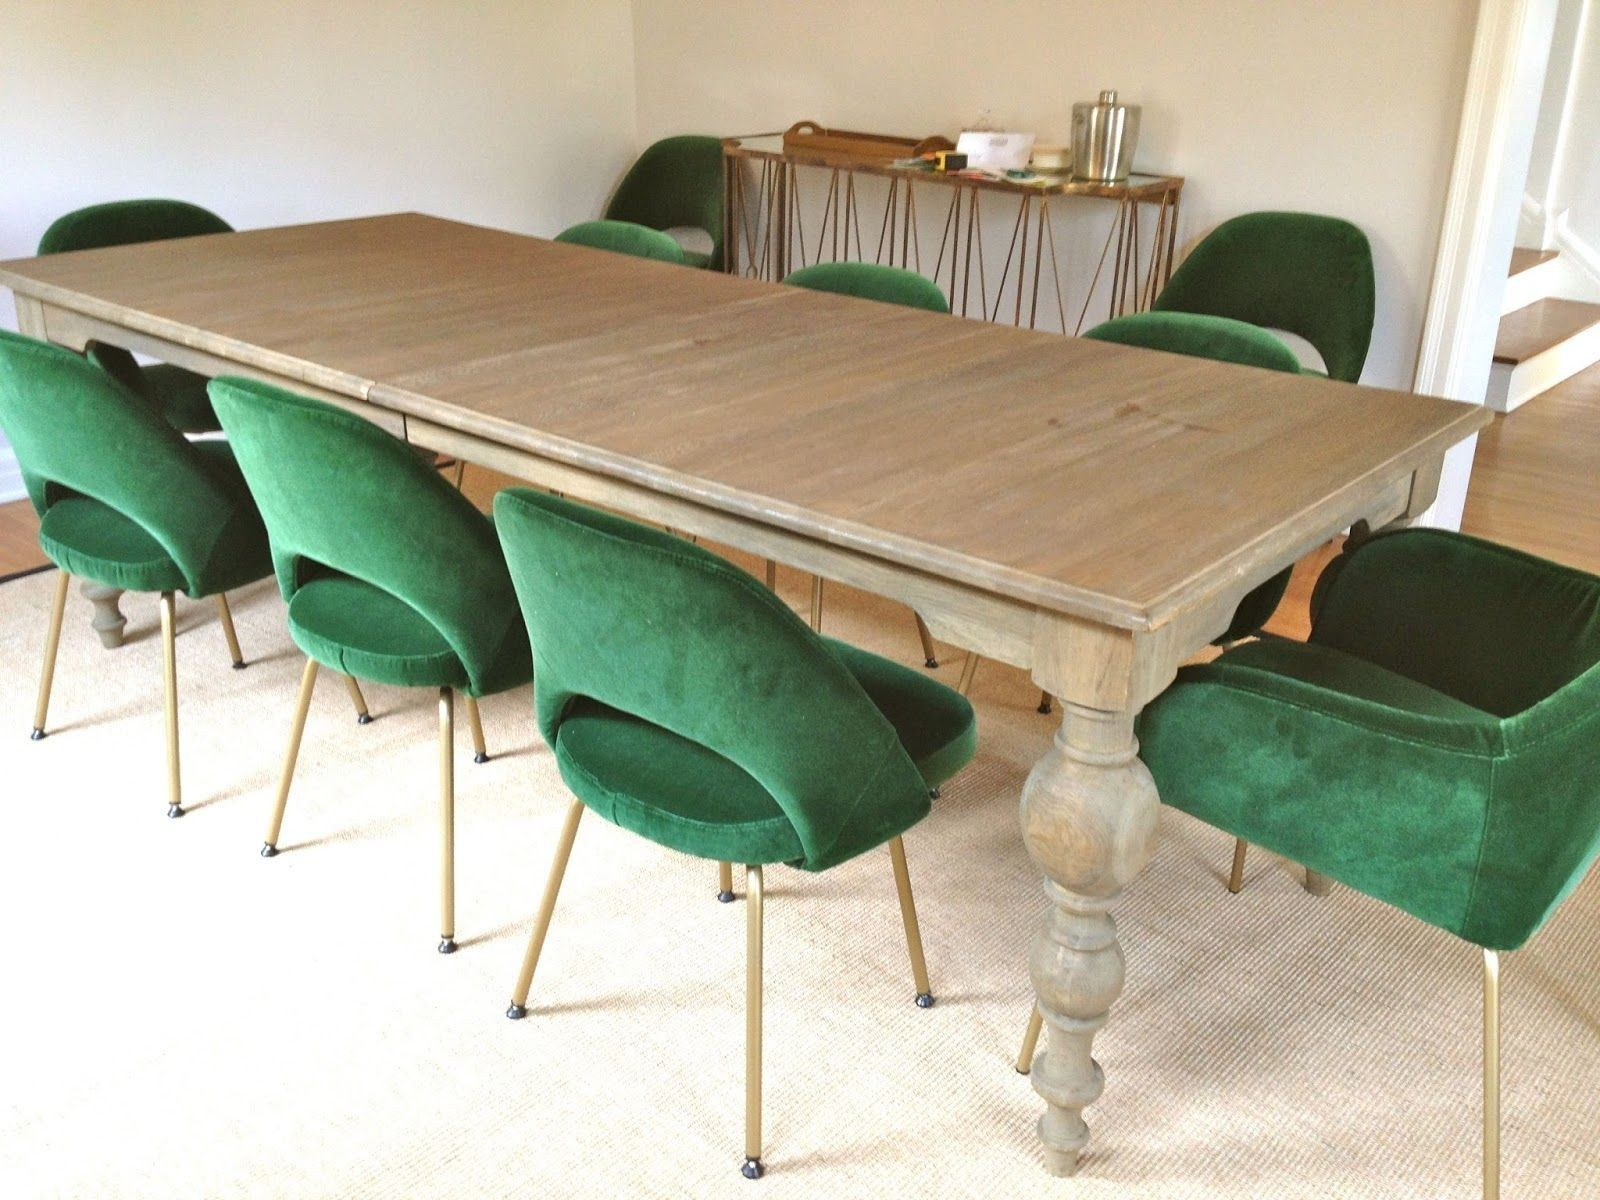 Velvet Dining Chairs Australia Chair Covers Mr Price Inspirational Green Dark